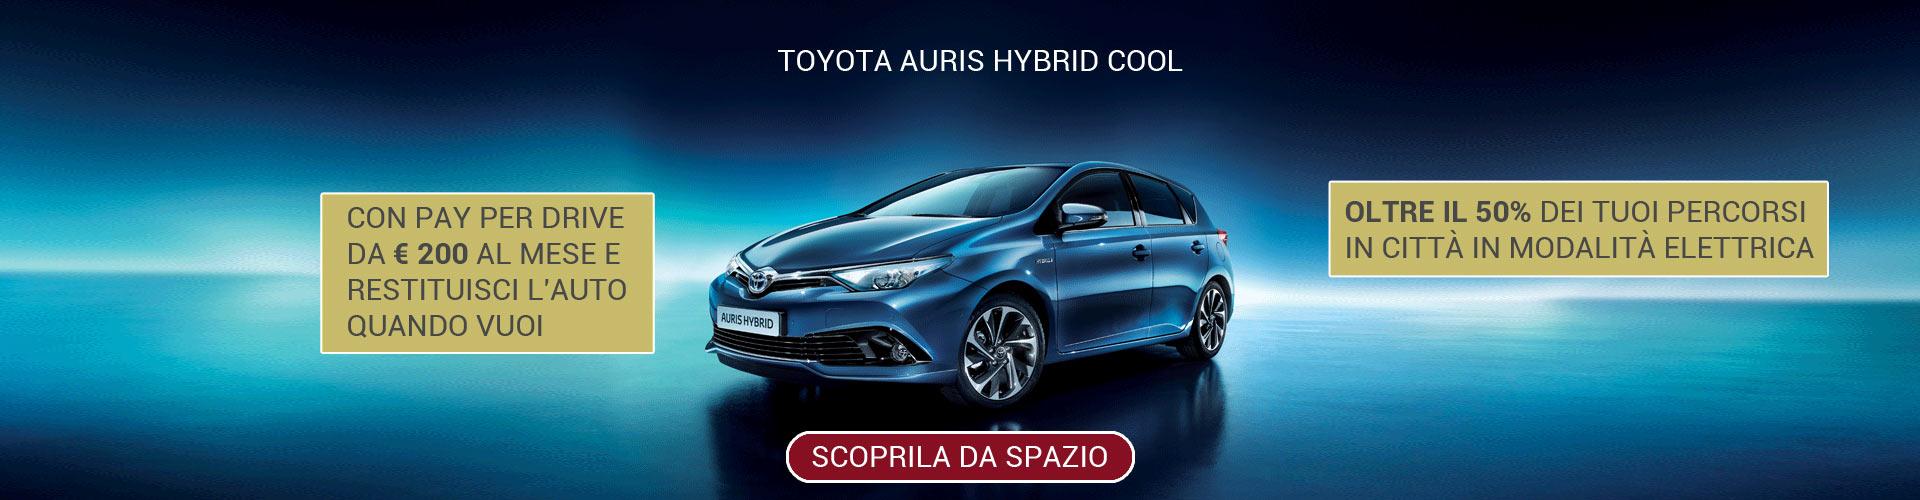 Toyota Auris Hybrid Cool